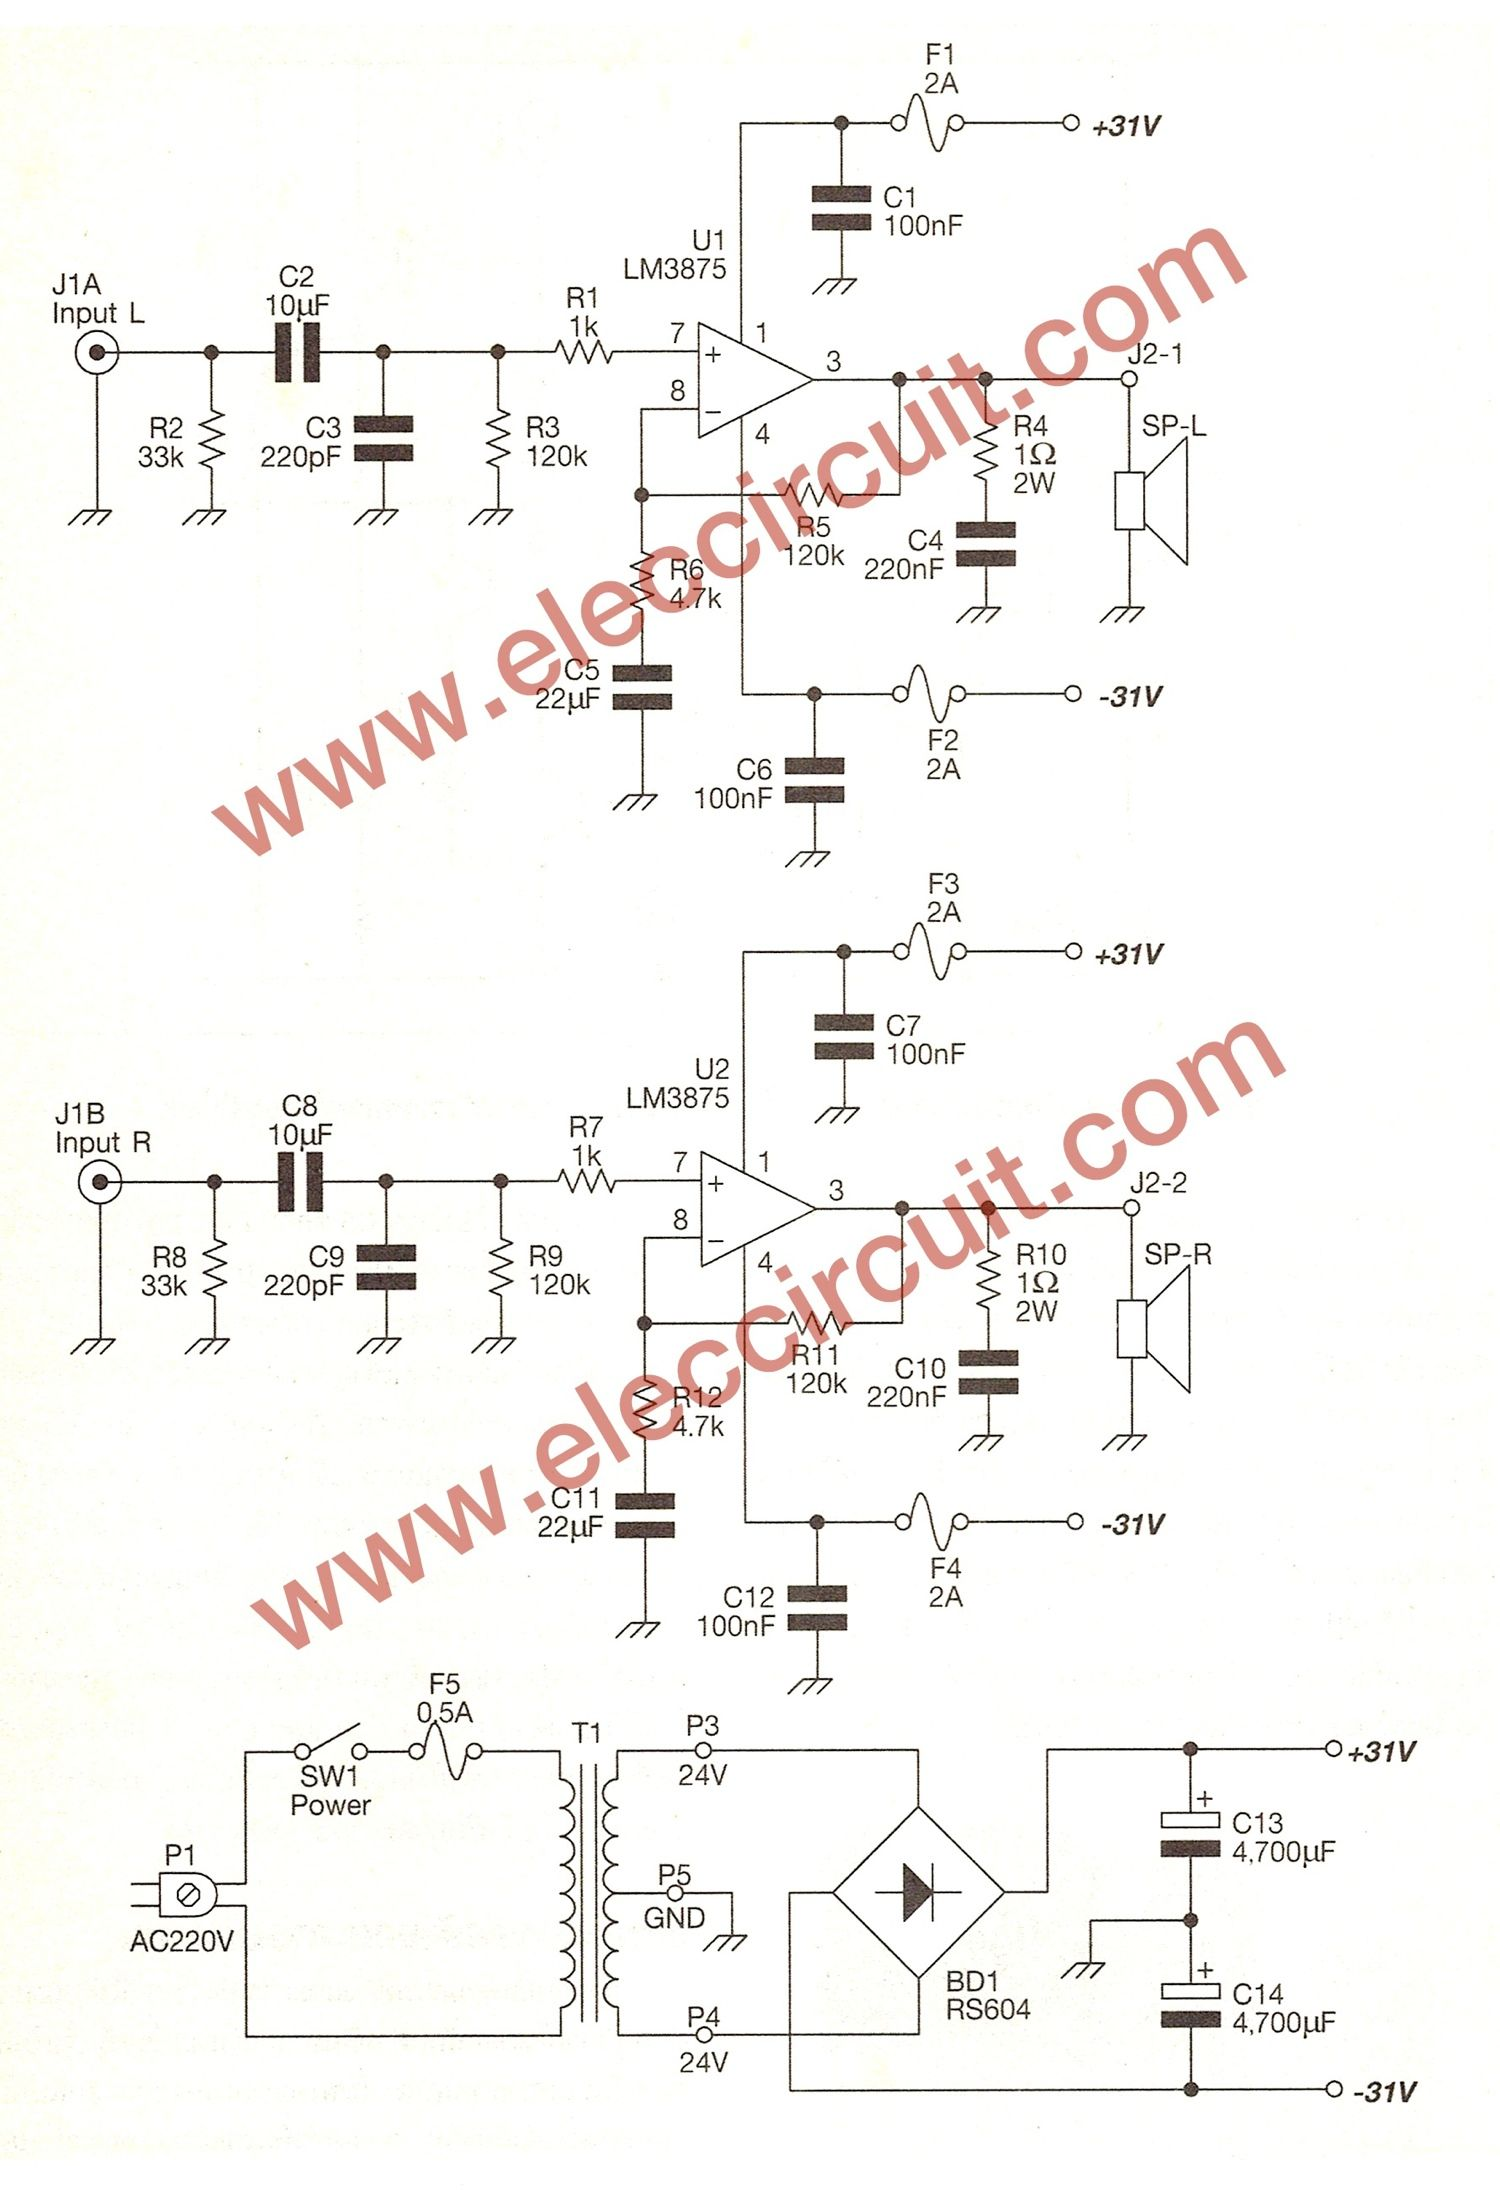 small resolution of gainclone amplifier circuit stereo 40w using lm3875 eleccircuit amplifier tda2030tda2030 circuitcircuit diagram 14w hifi audio